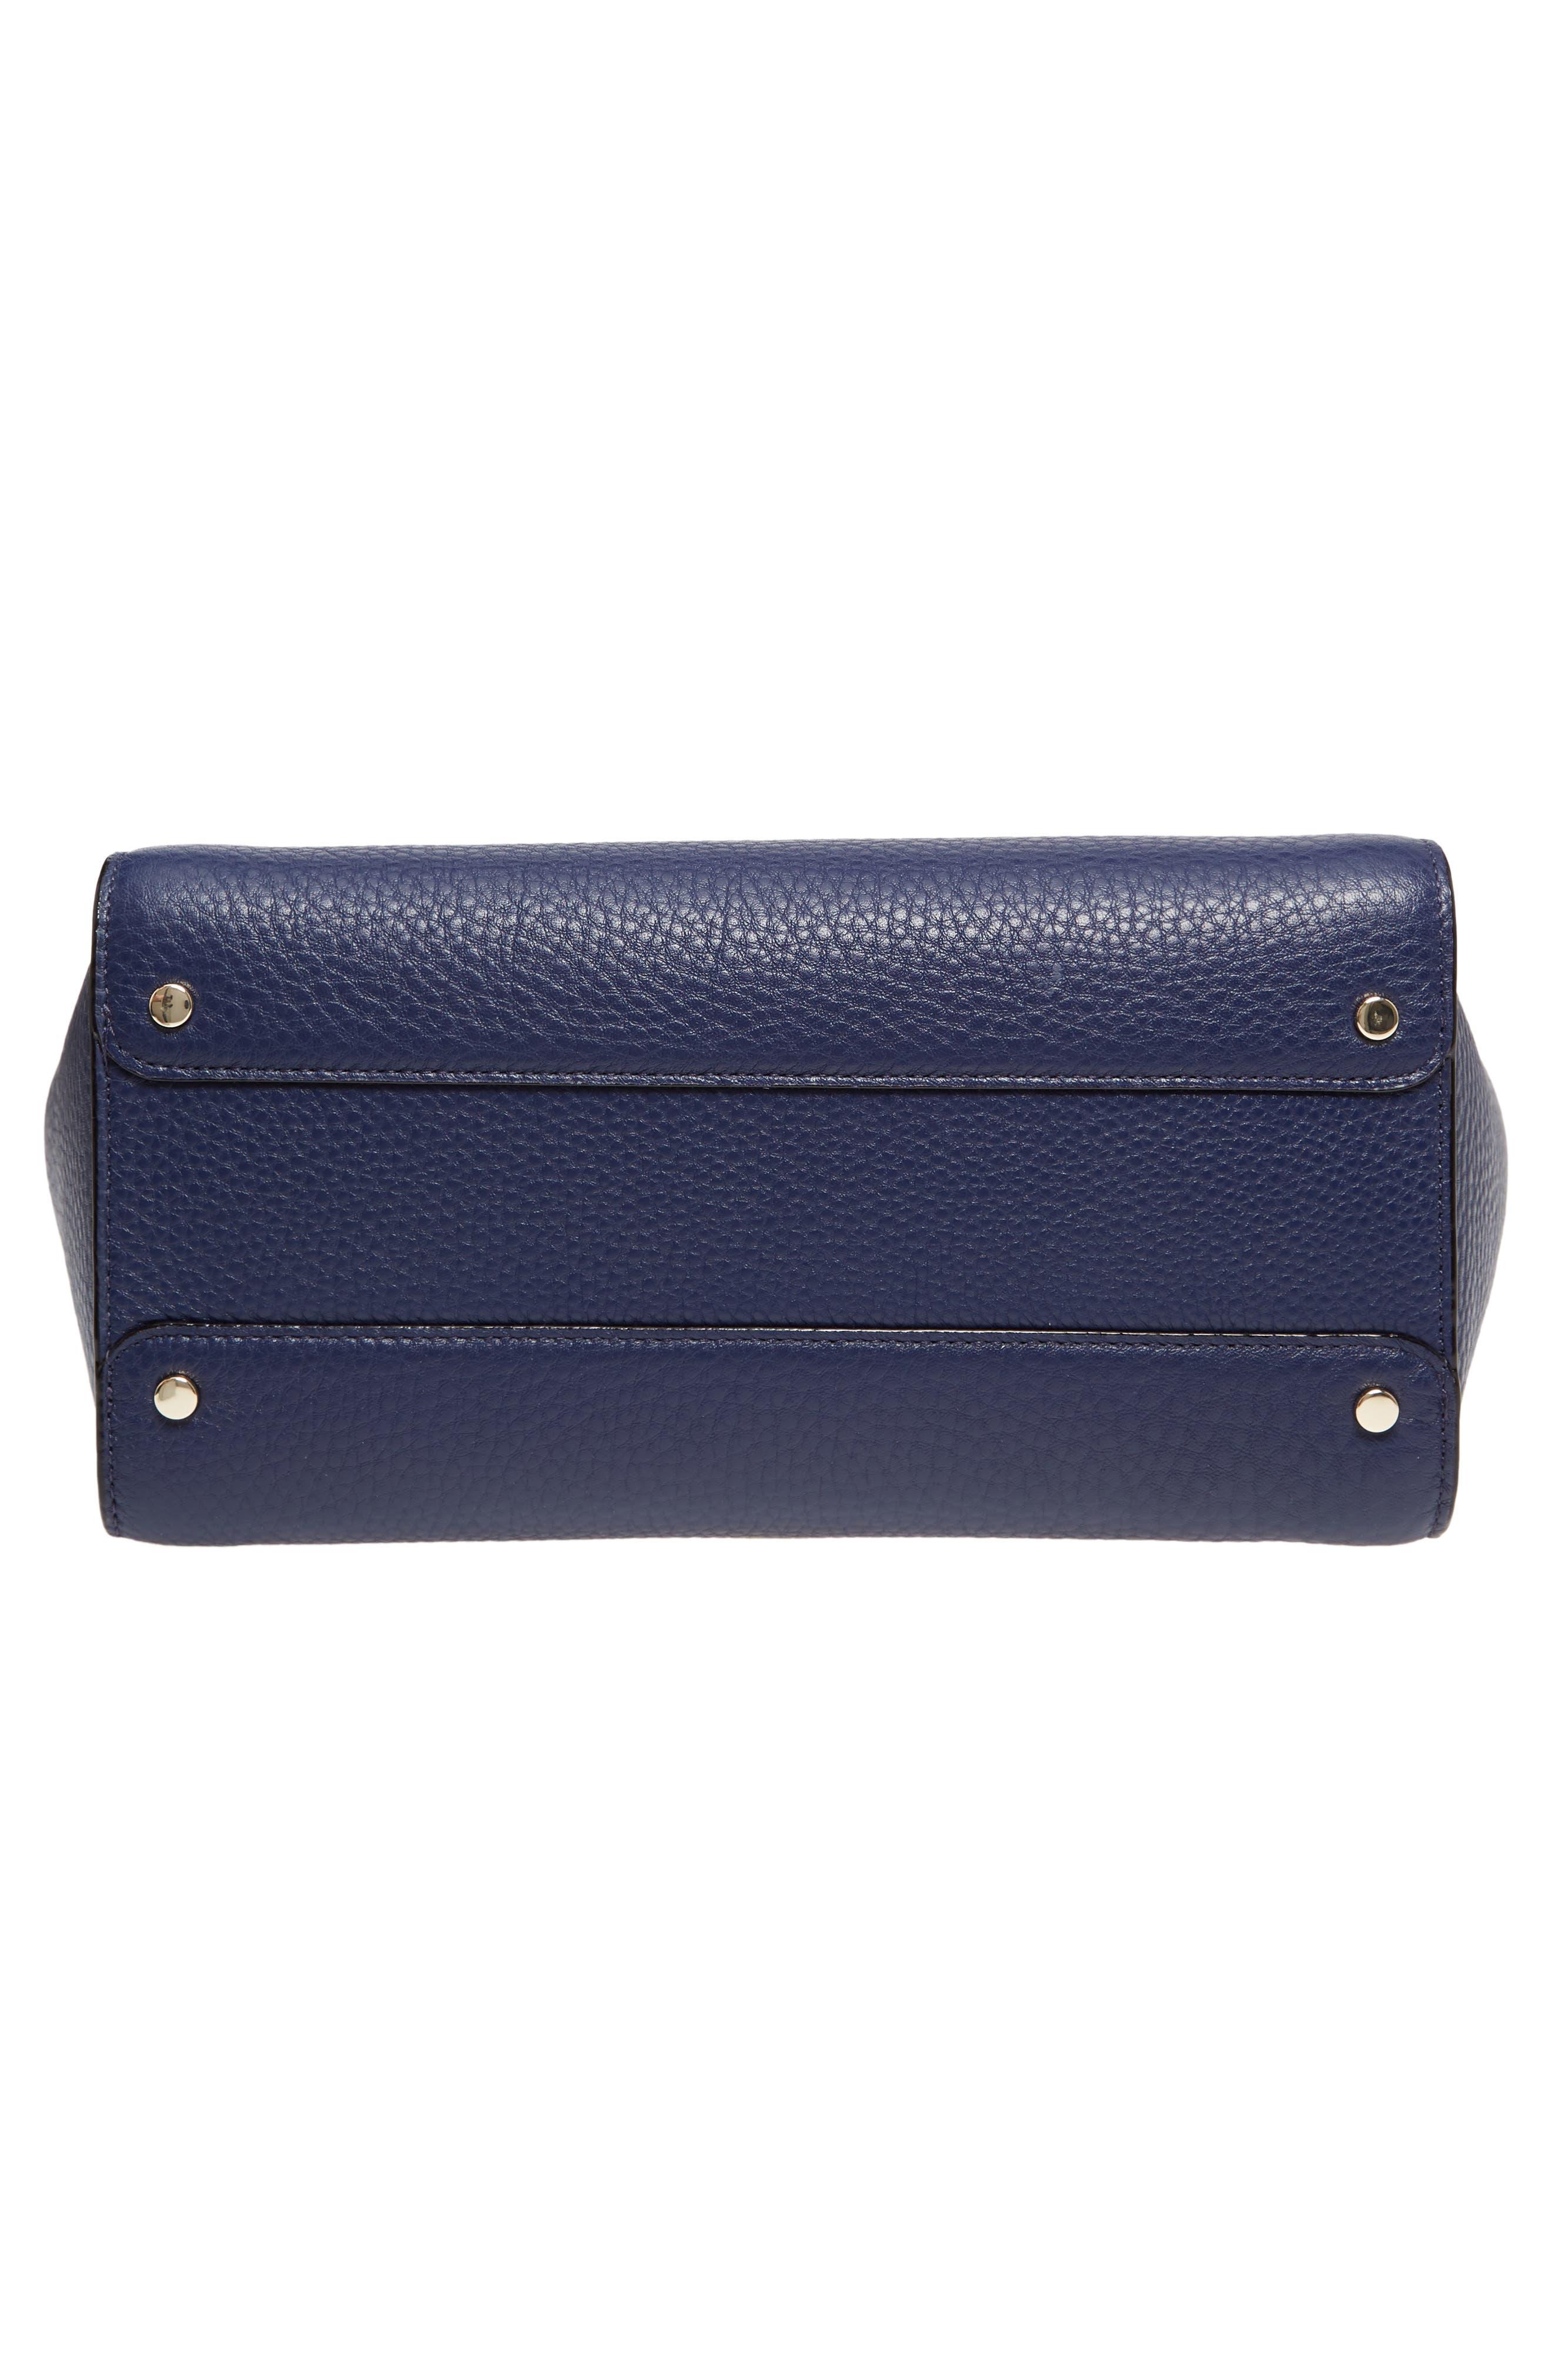 carlyle street - alexa leather satchel,                             Alternate thumbnail 12, color,